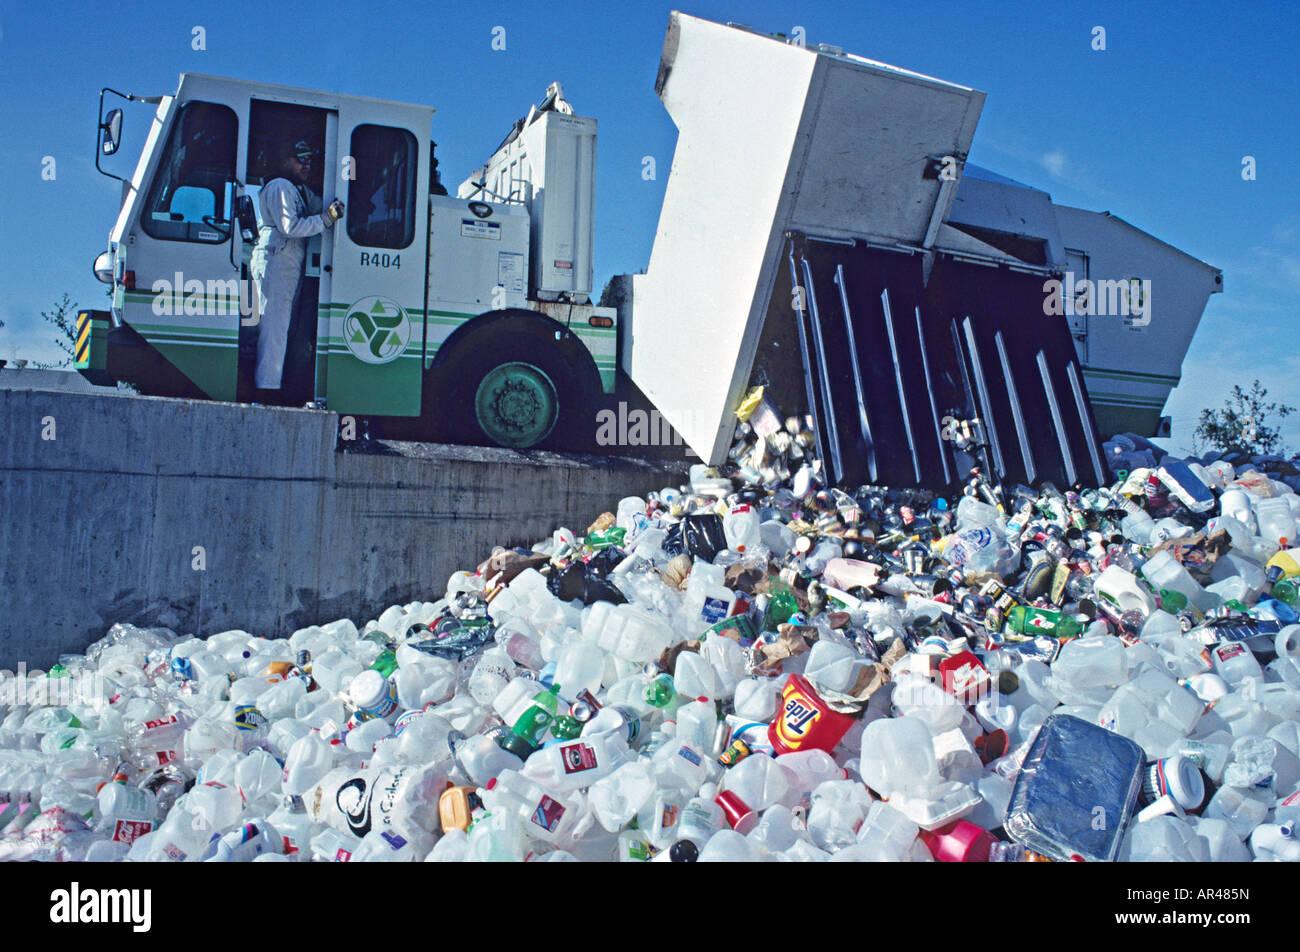 Recycling station, Richmond, California - Stock Image